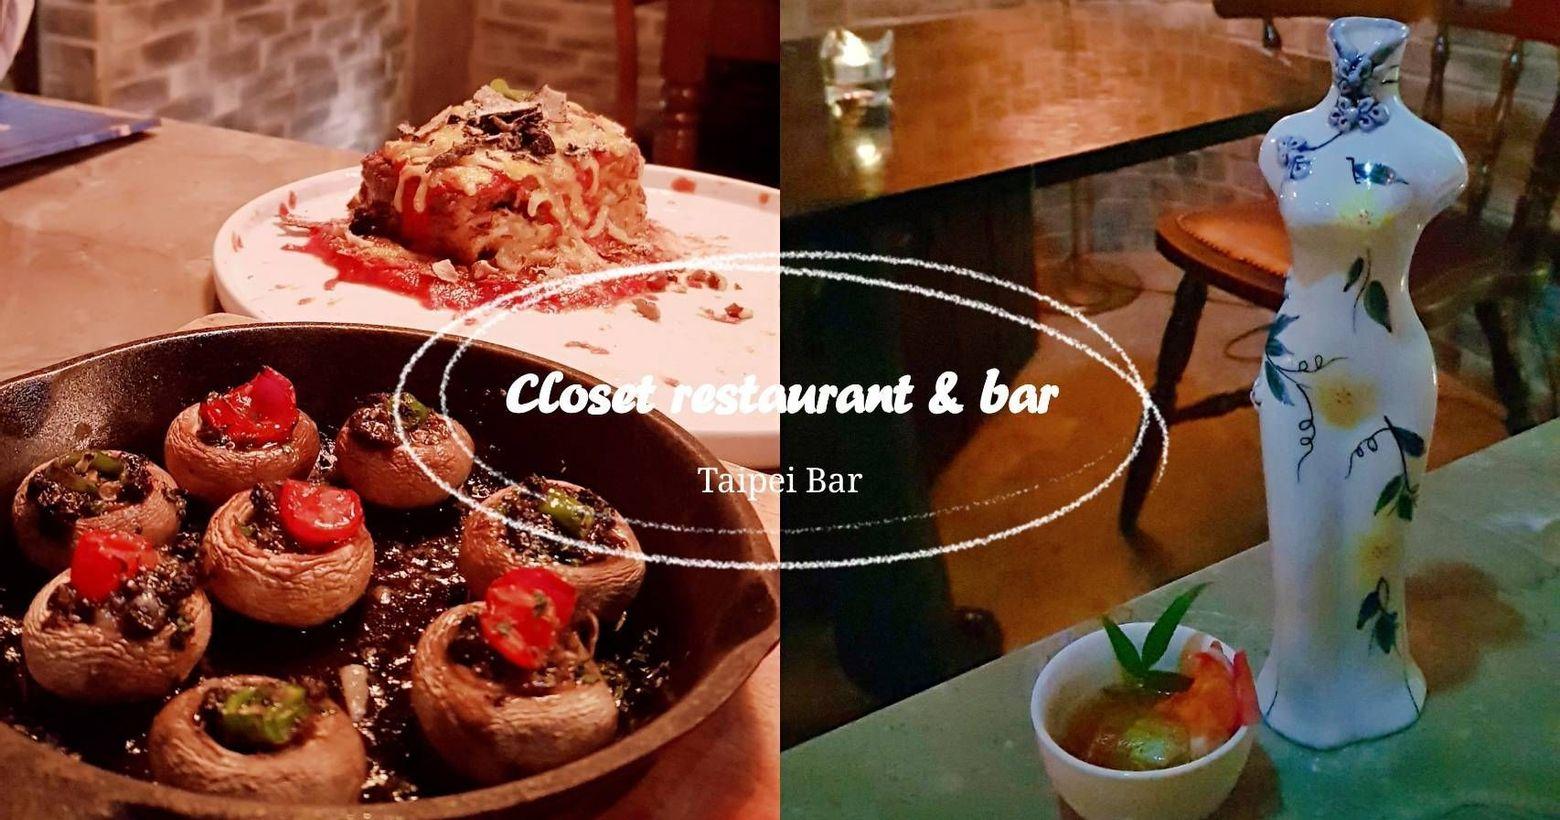 Taipei bar| 一秒讓人體驗古歐風地窖氛圍,特製異國料理與創意美味調酒讓人再三回味_Clos